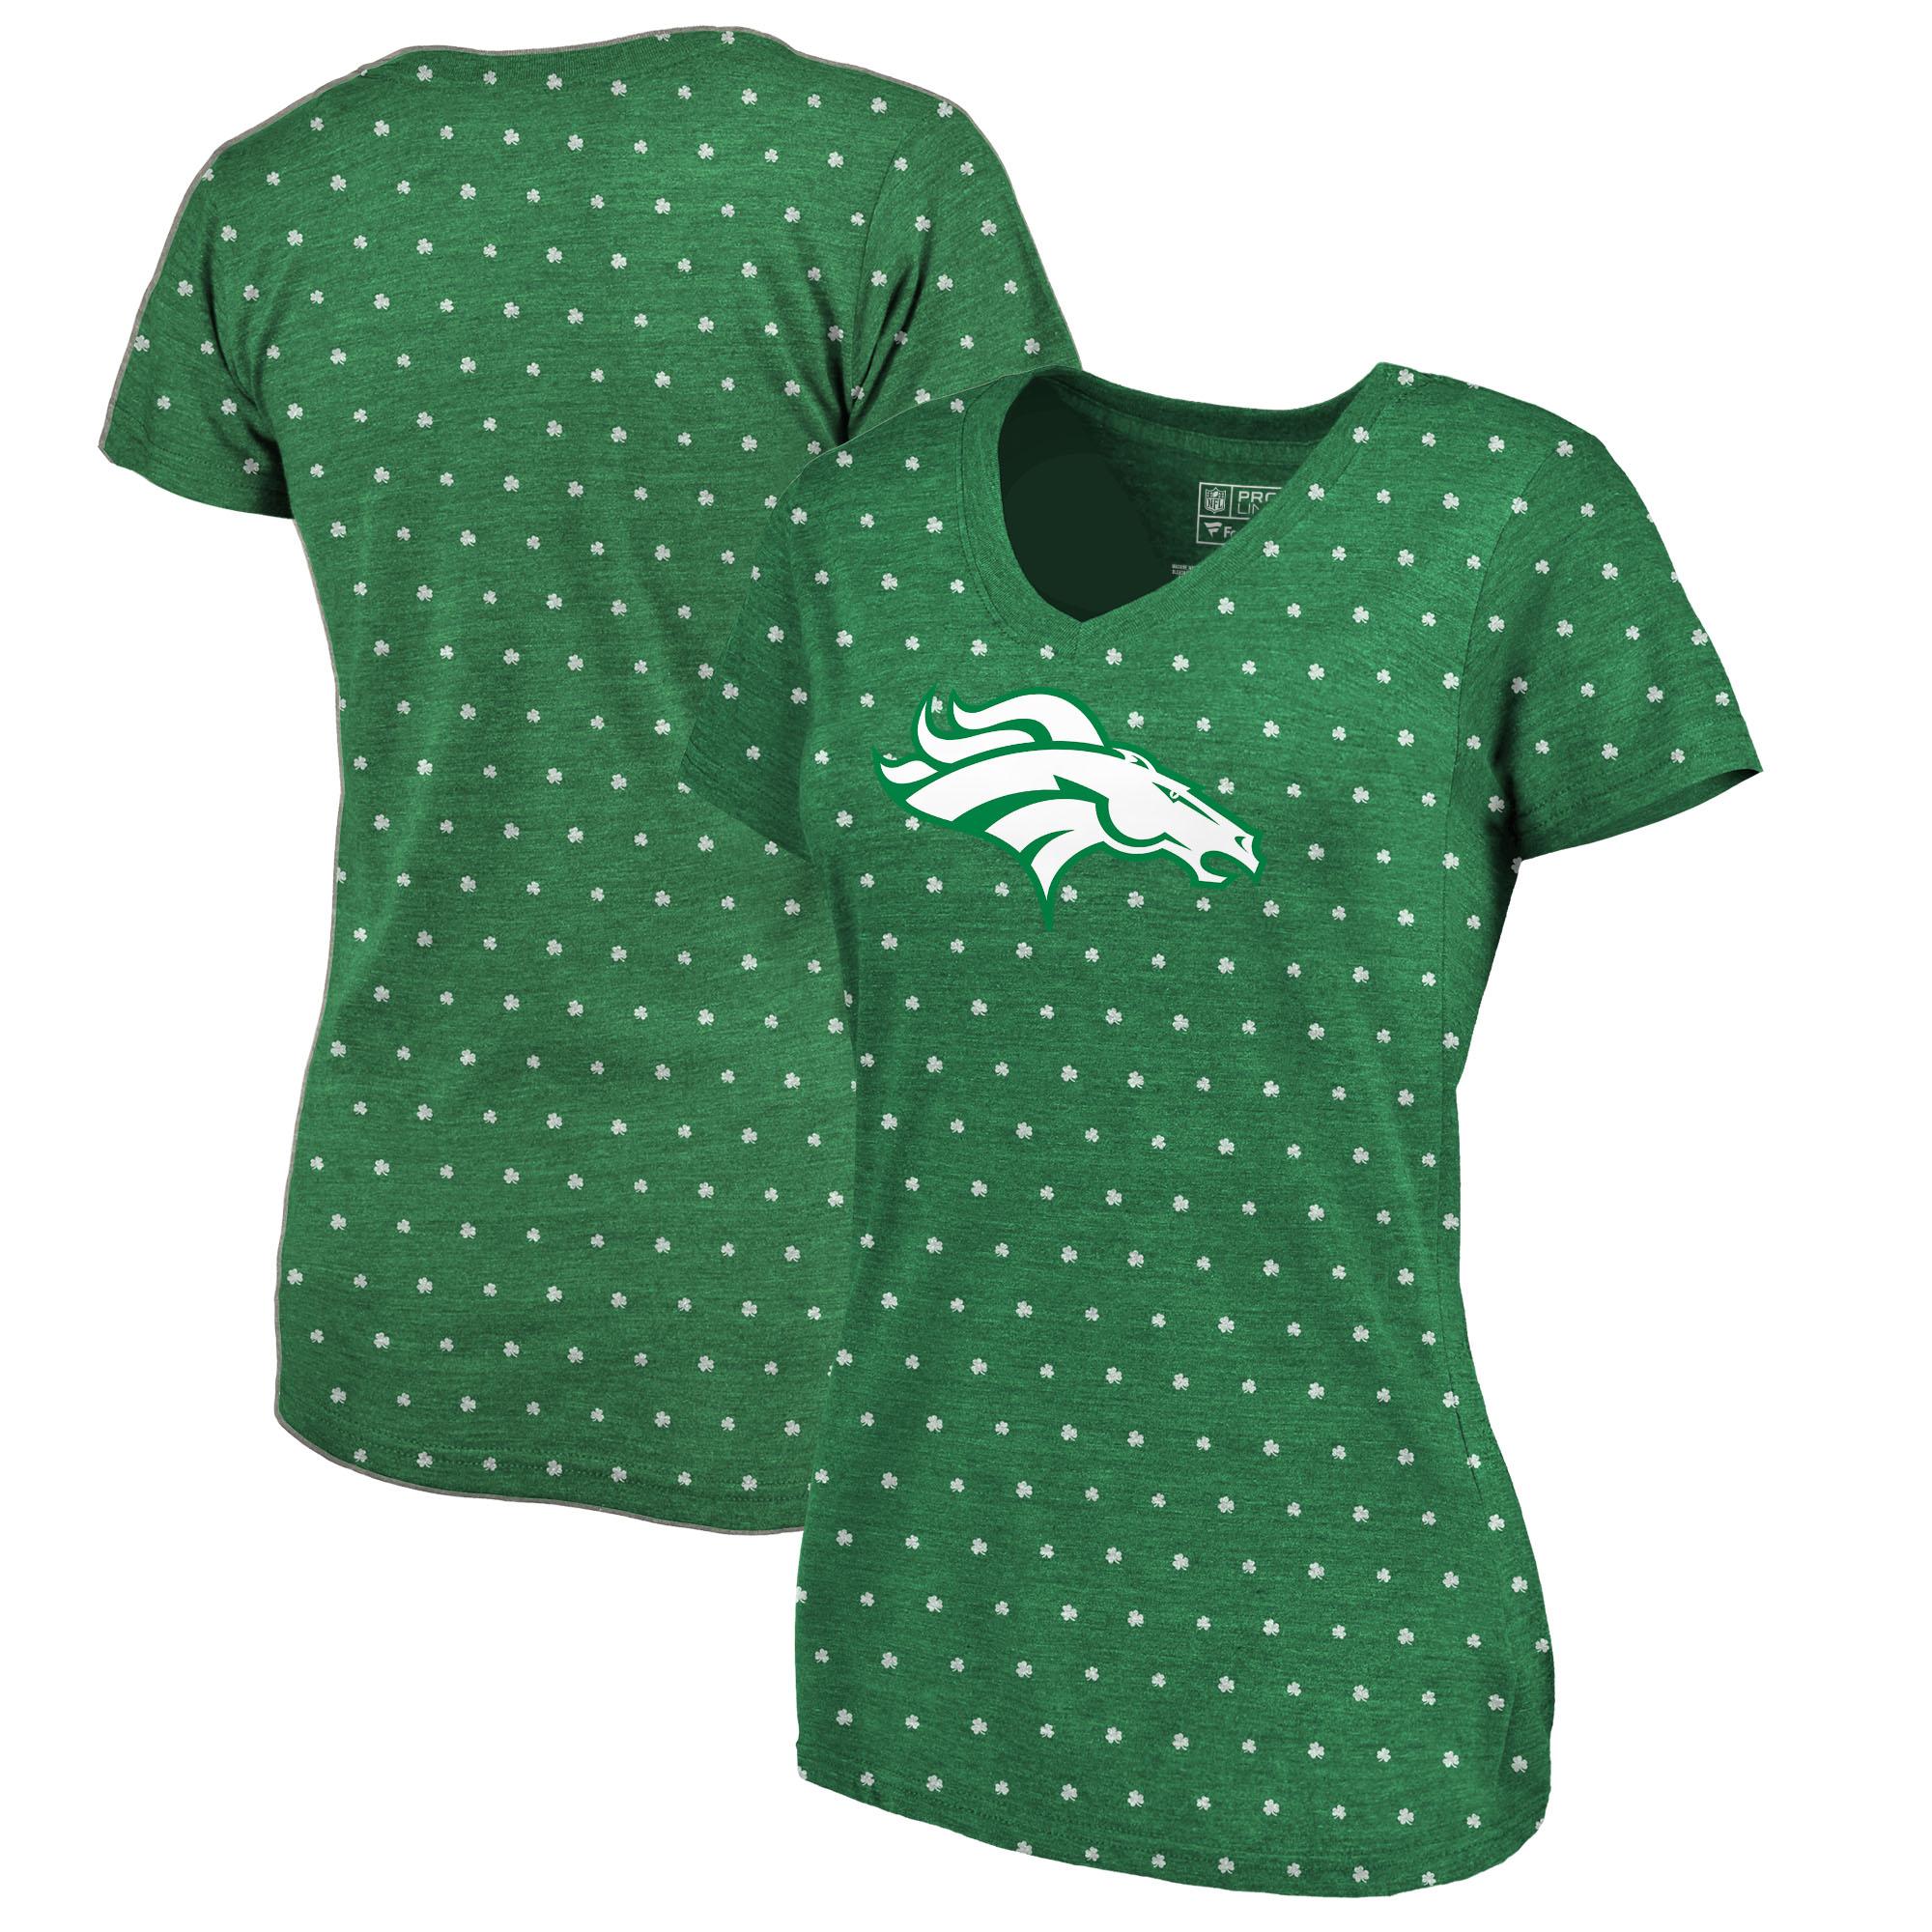 Denver Broncos NFL Pro Line by Fanatics Branded Women's St. Patrick's Day All Irish V-Neck Tri-Blend T-Shirt - Kelly Green